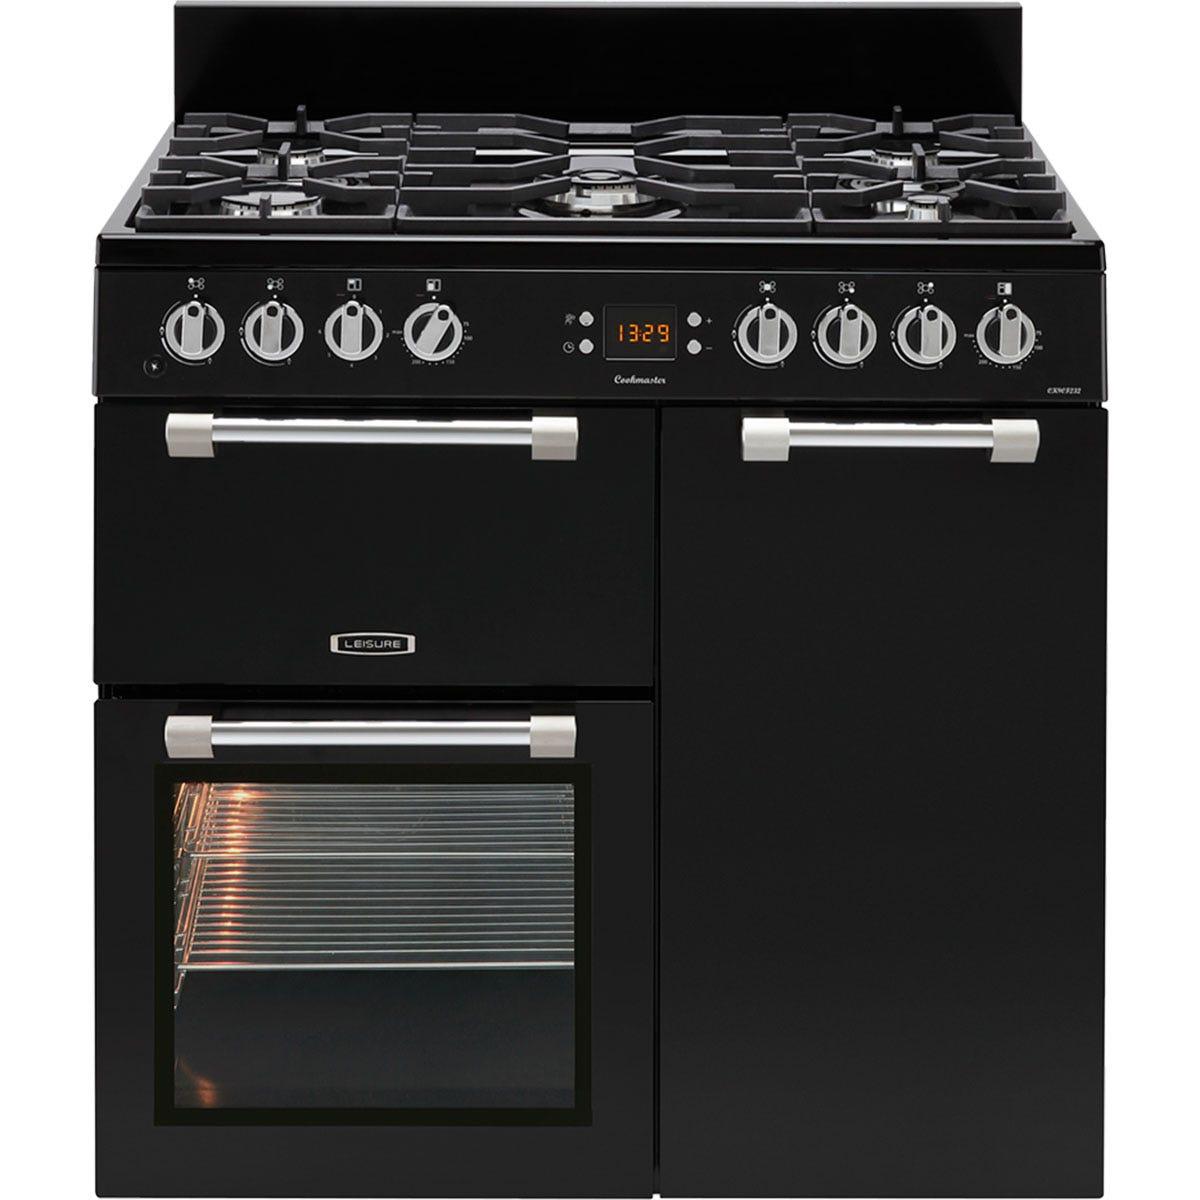 Leisure CK90F232K 90cm Cookmaster Dual Fuel Range Cooker - Black